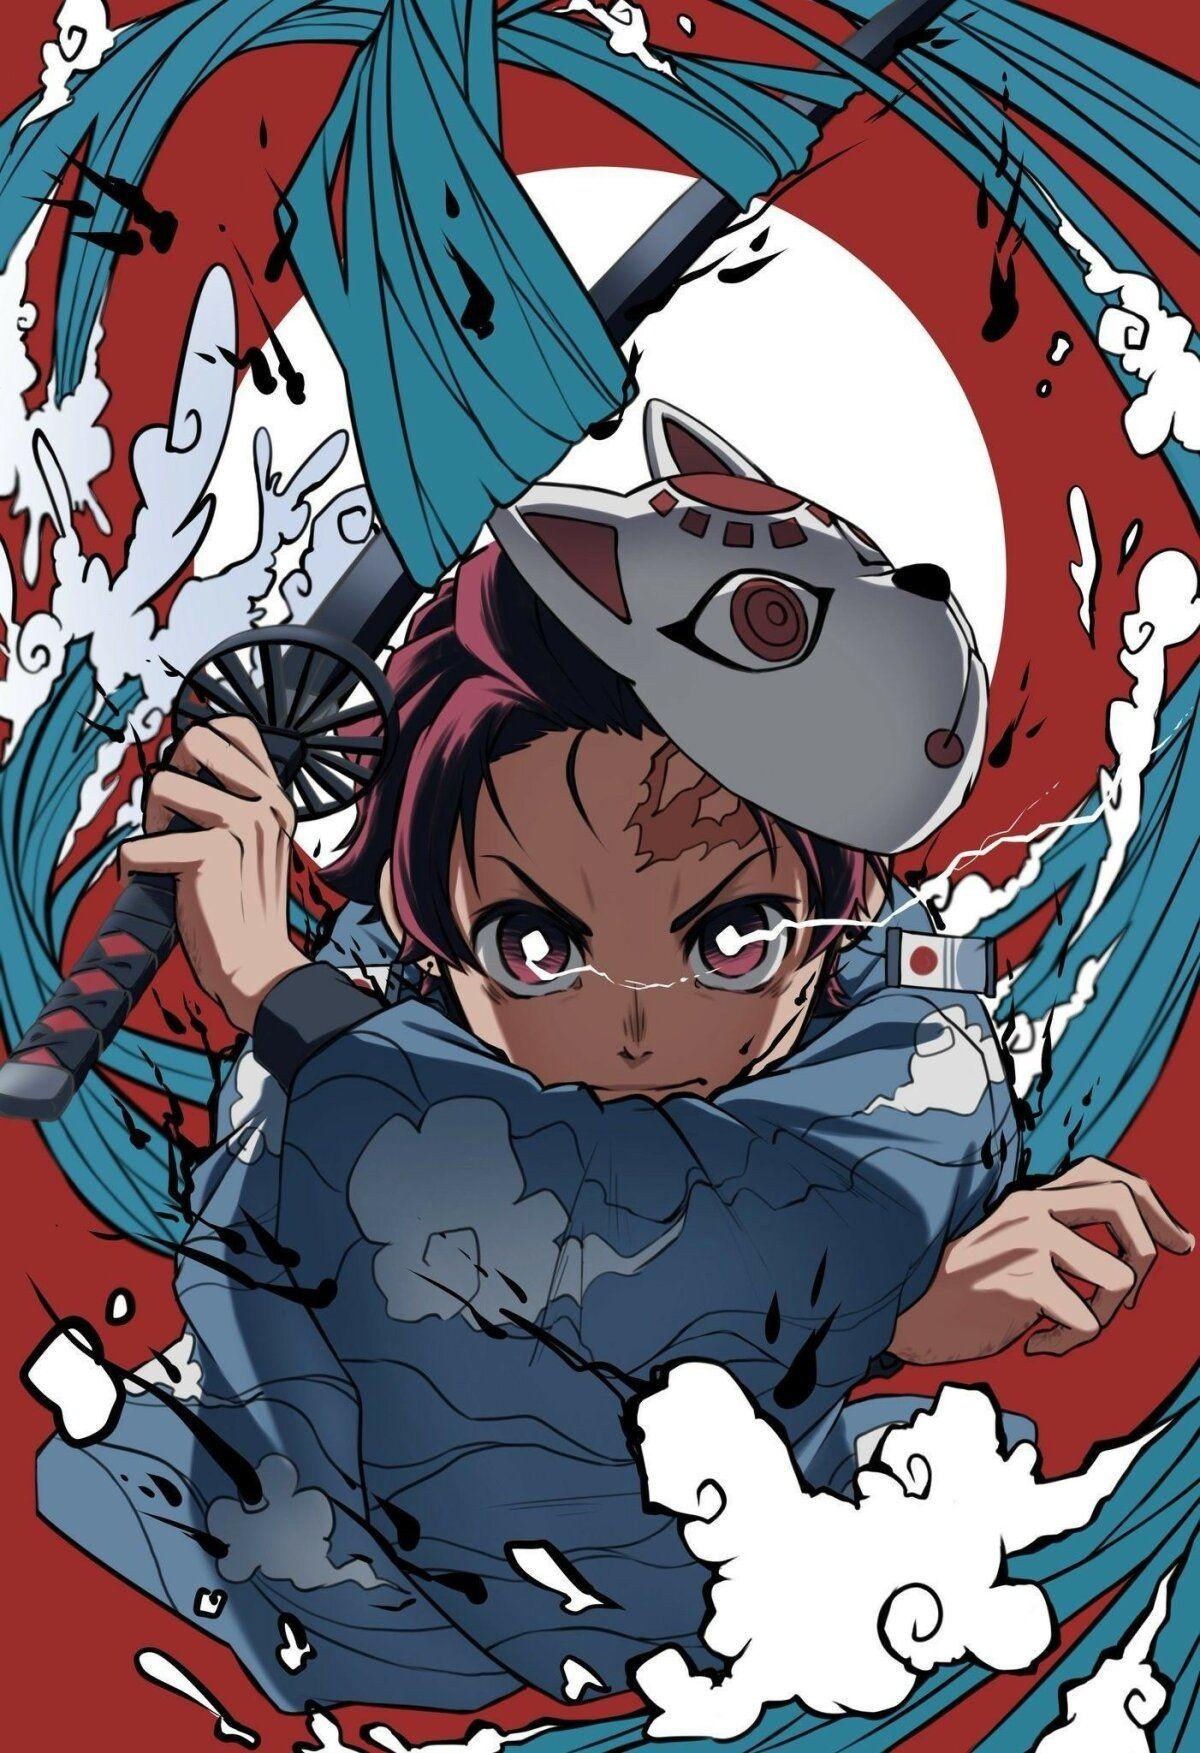 خلفيات أنيمي Anime تانجيرو Tanjiro ياباني 35 in